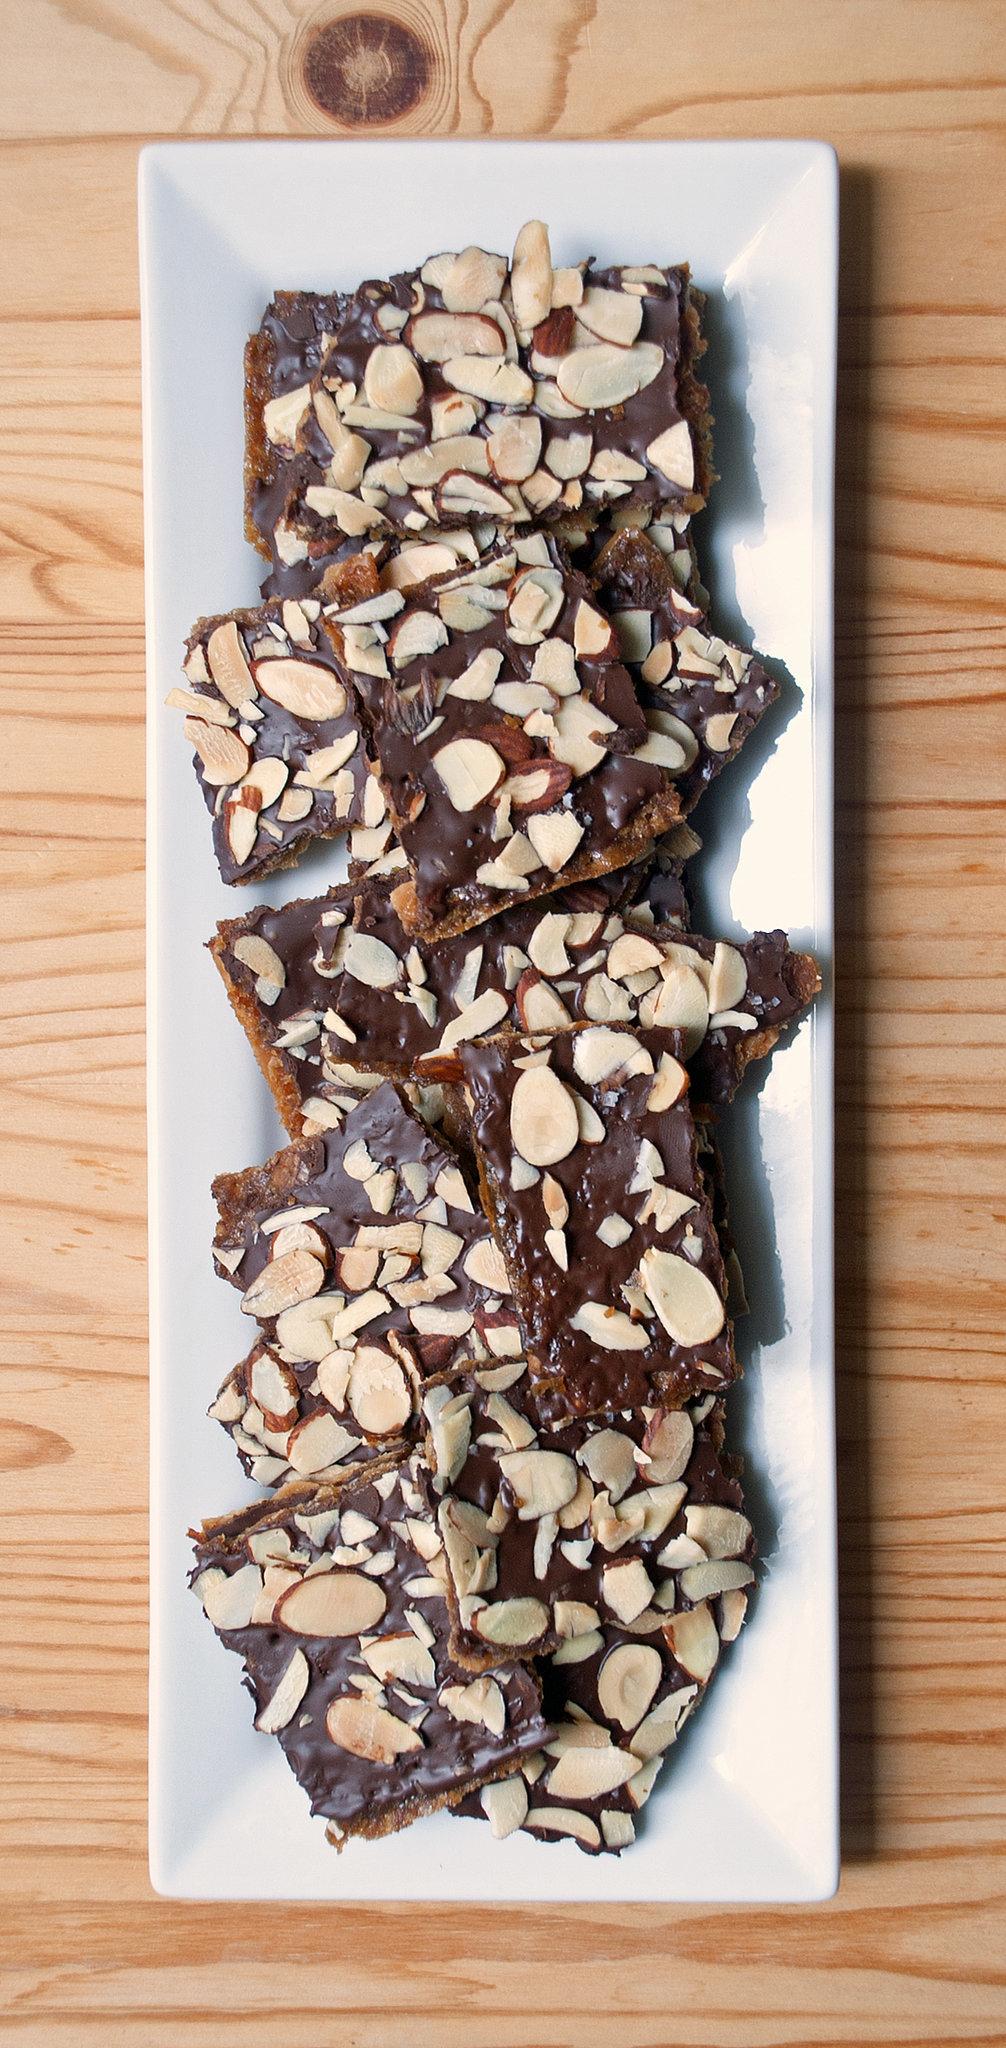 Chocolate-Covered Almond Matzo Toffee